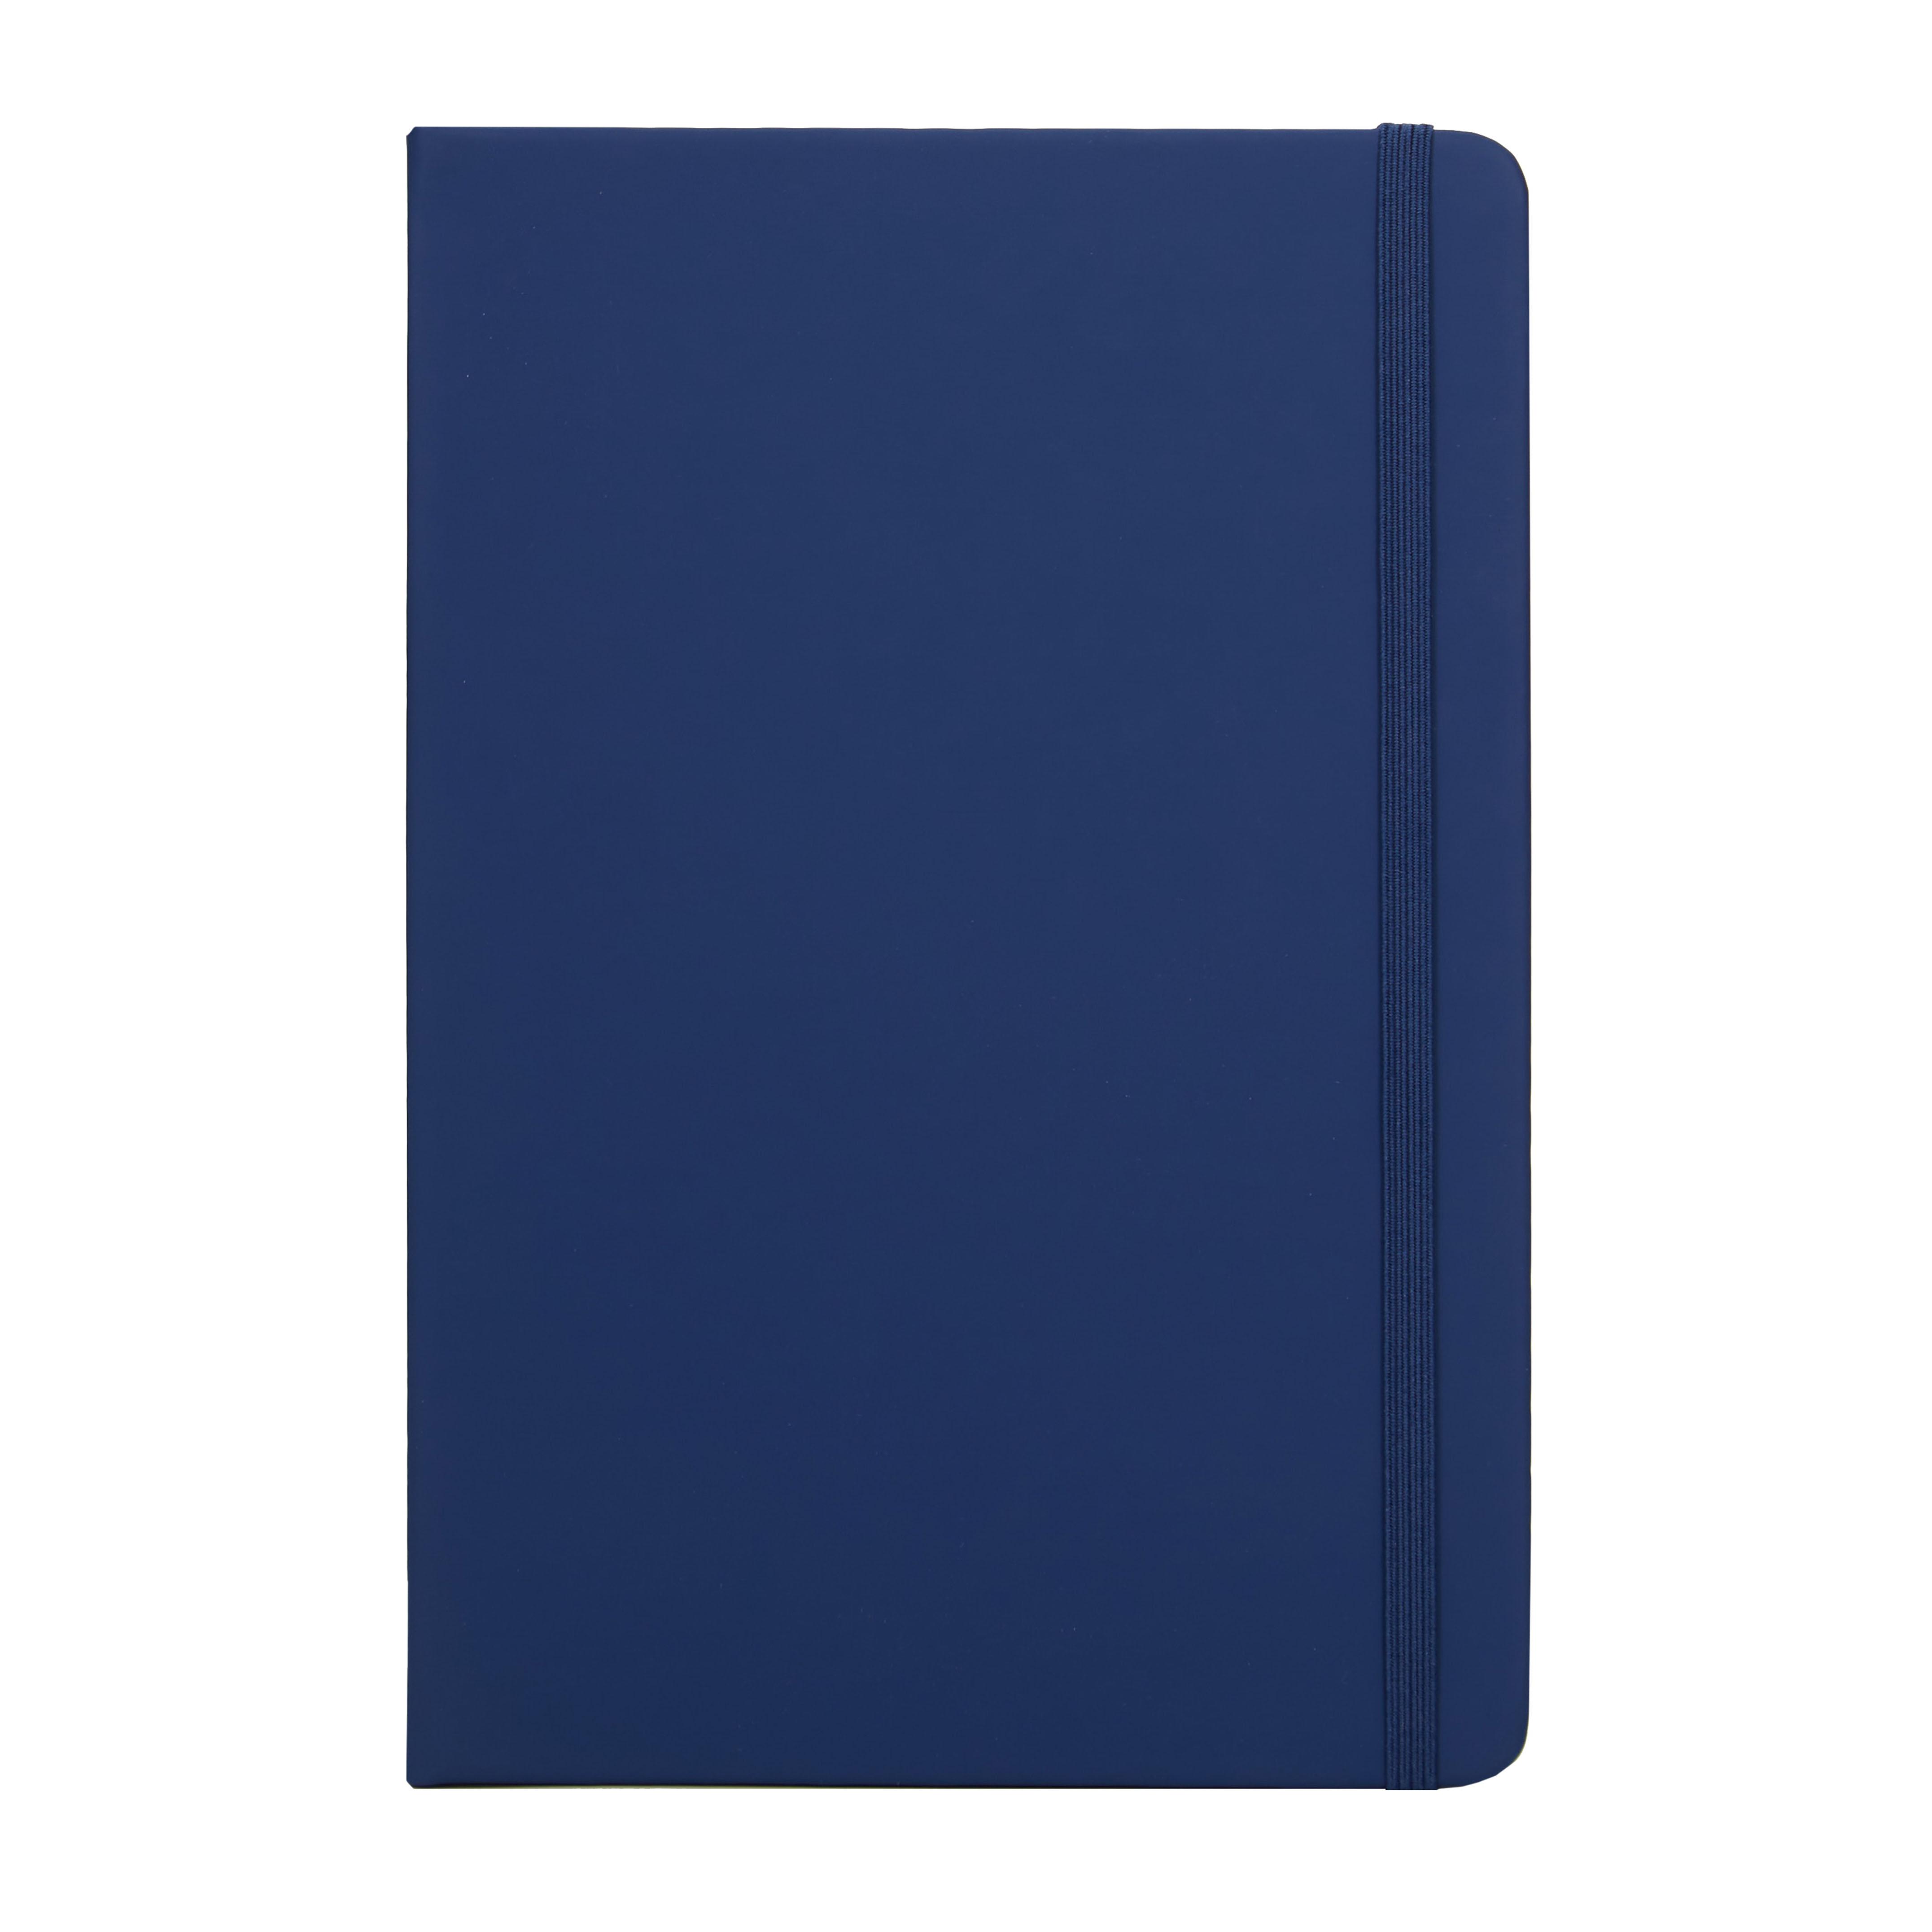 Cuaderno JOURNAL A5 64 hojas